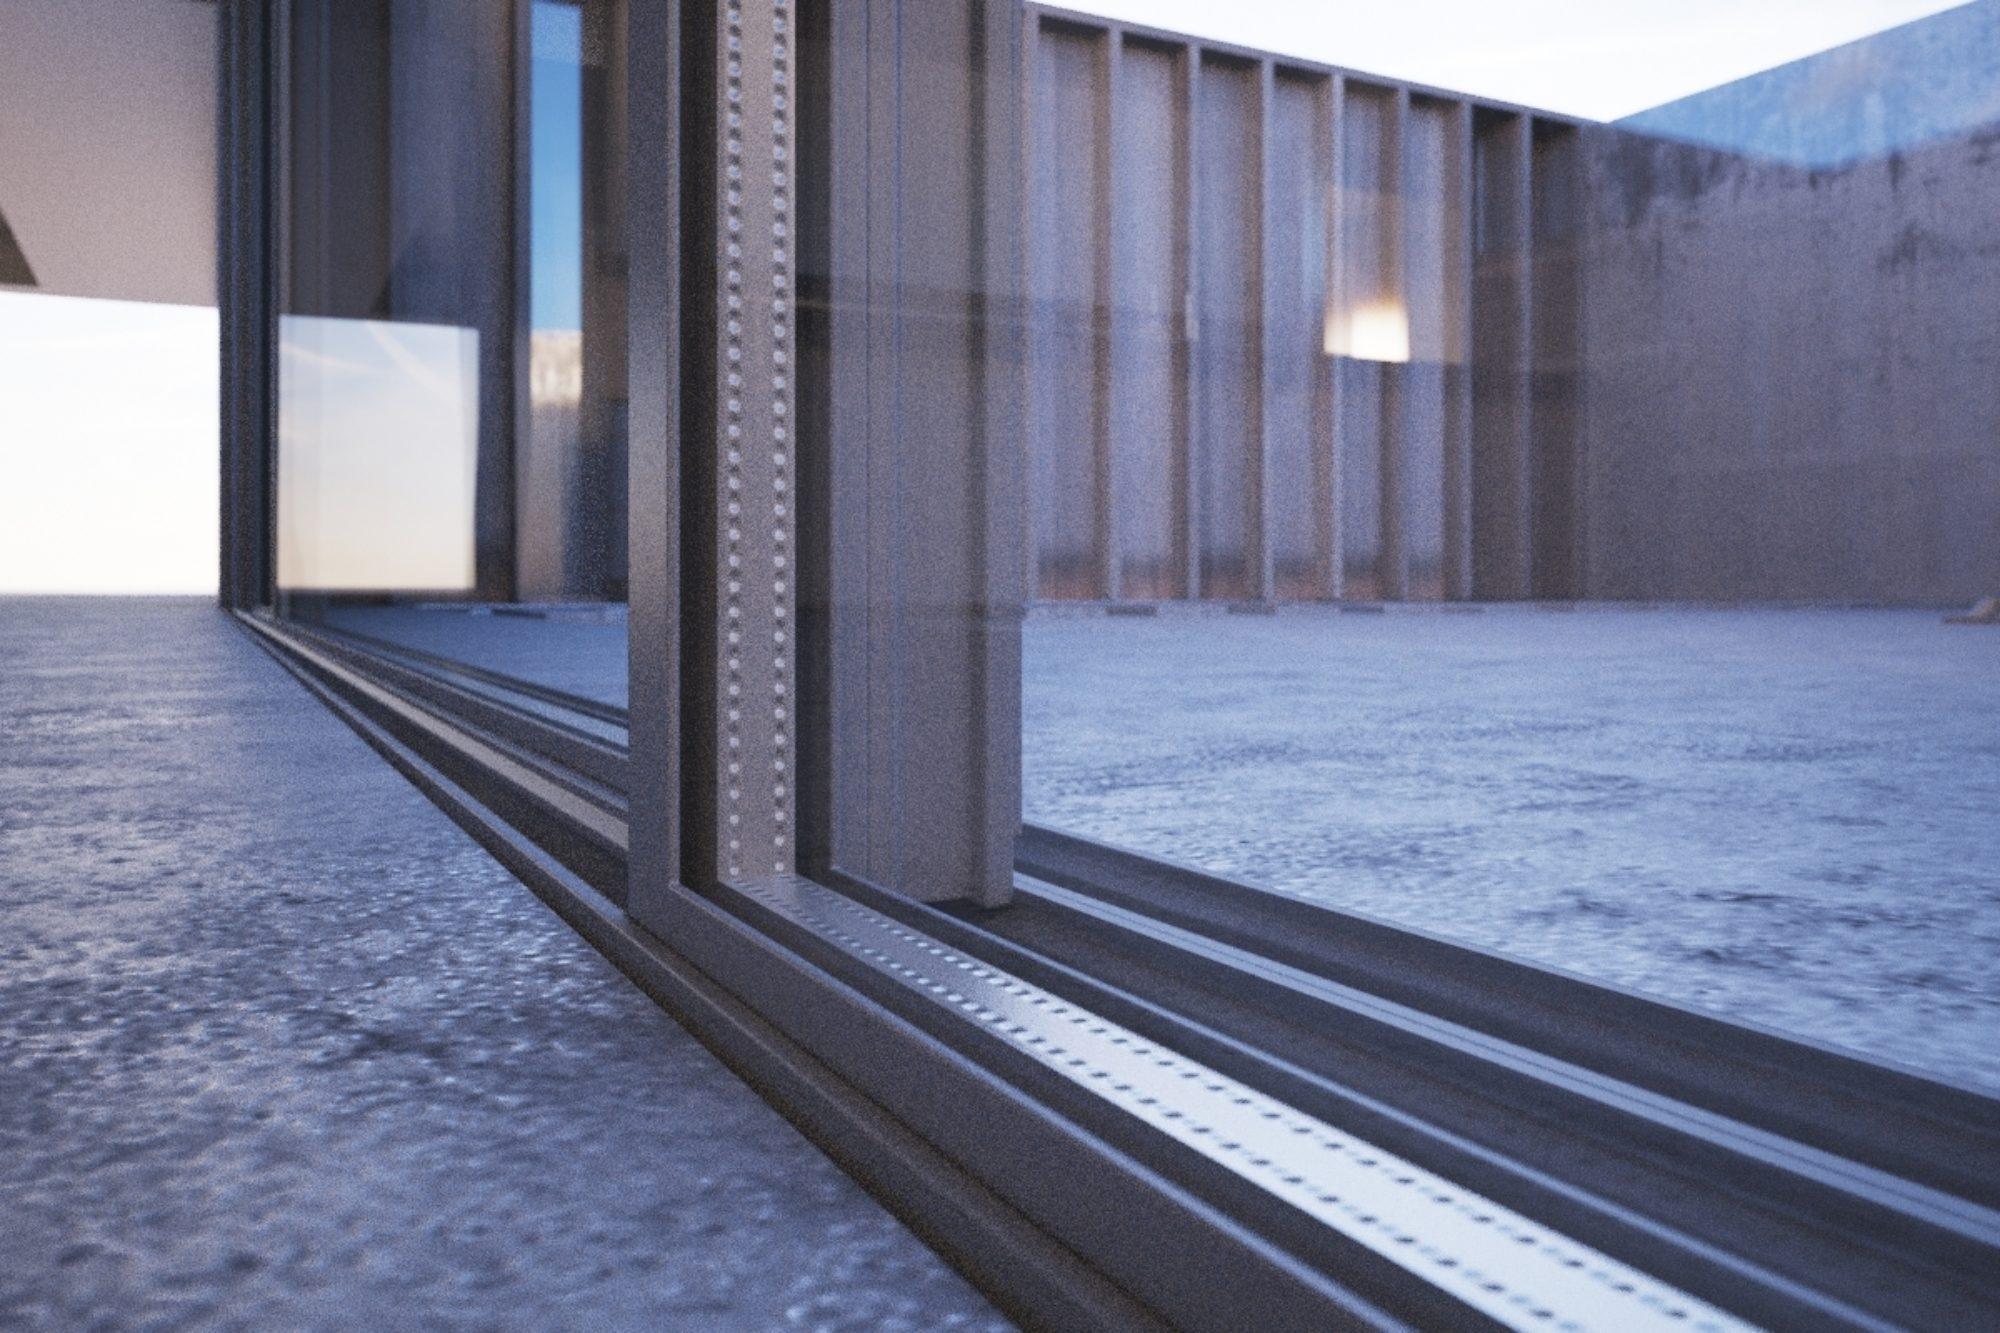 Carey House Tutorial 04 - Texturing